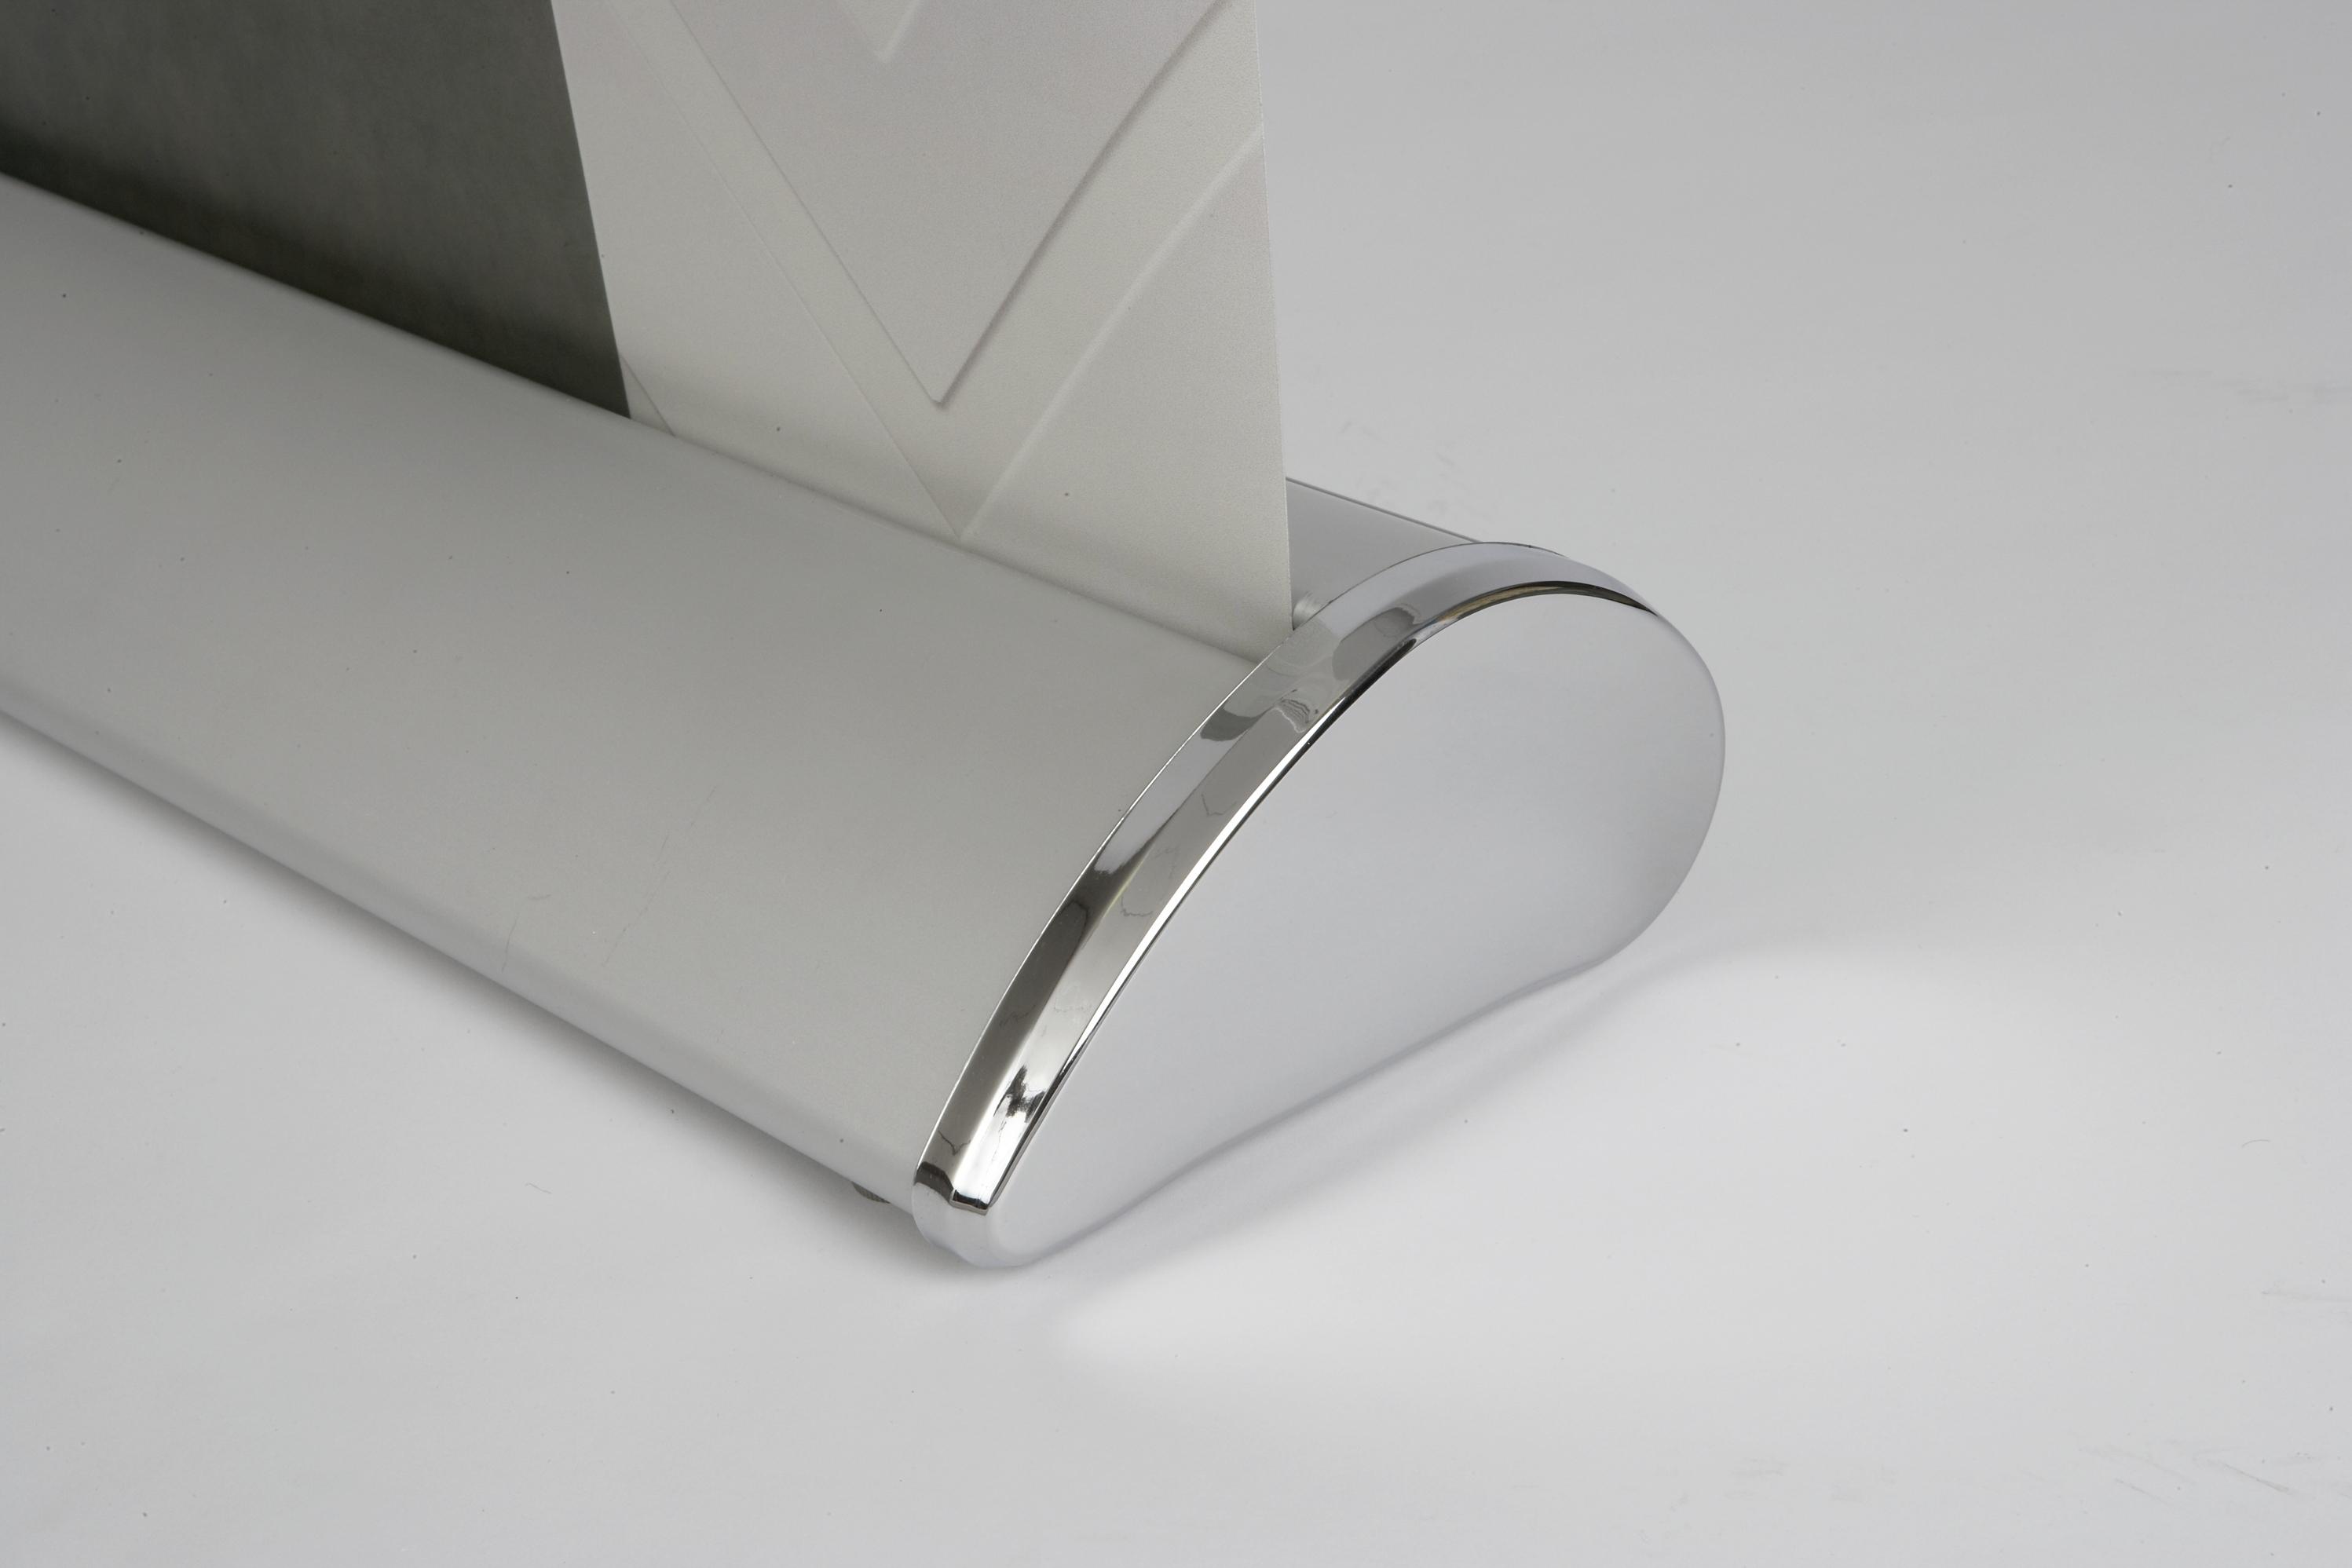 610gsm Premium Pop-Up Display